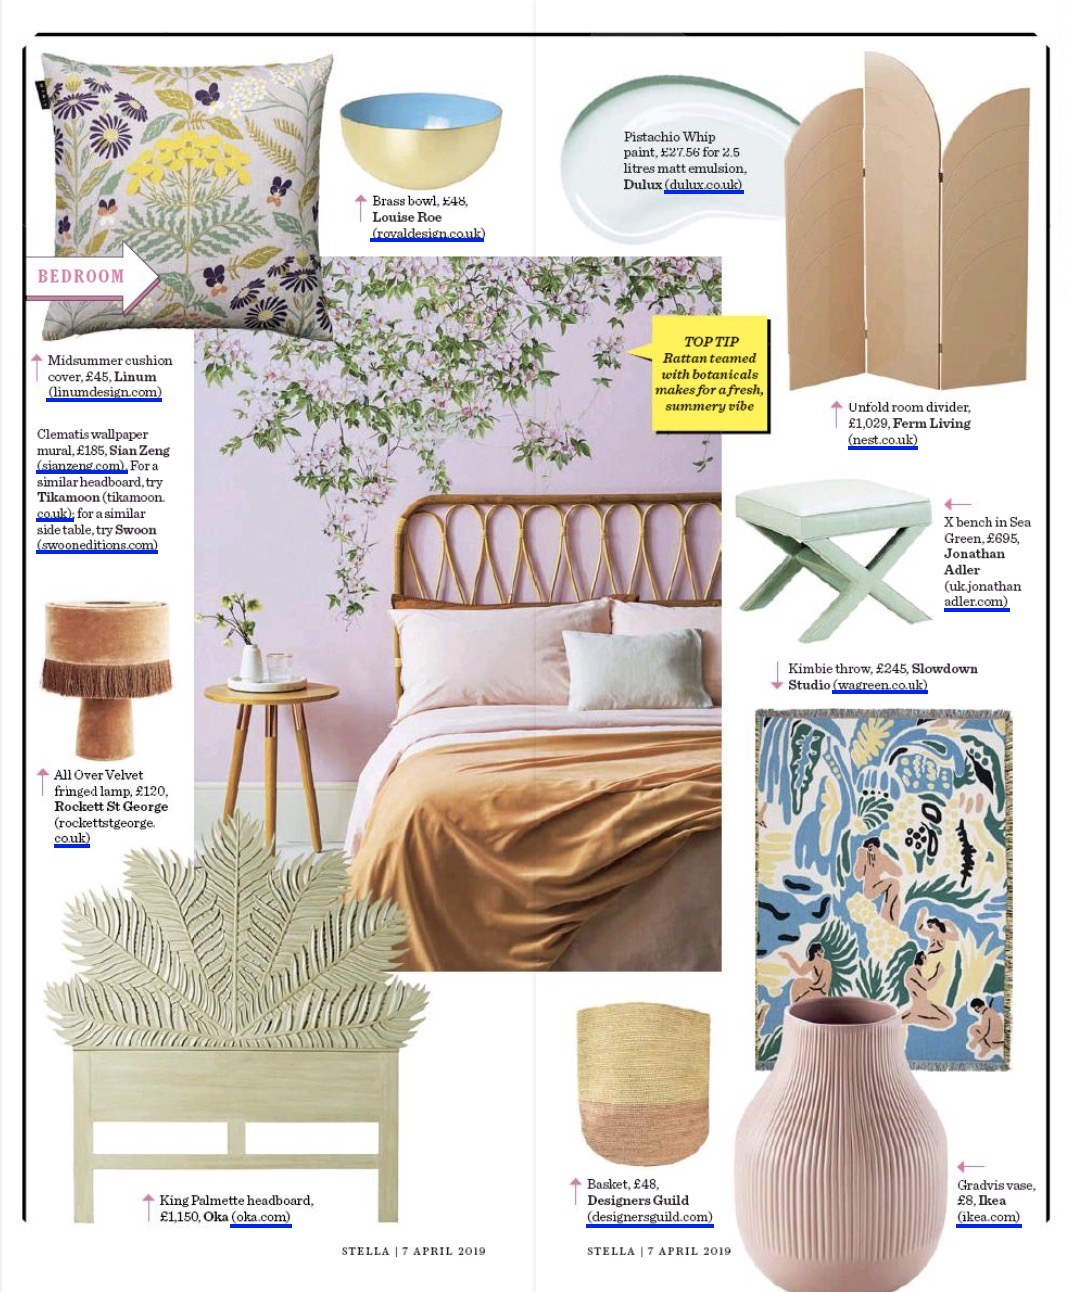 The Telegraph Stella Magazine 07-04-2019 Tikamoon.jpg